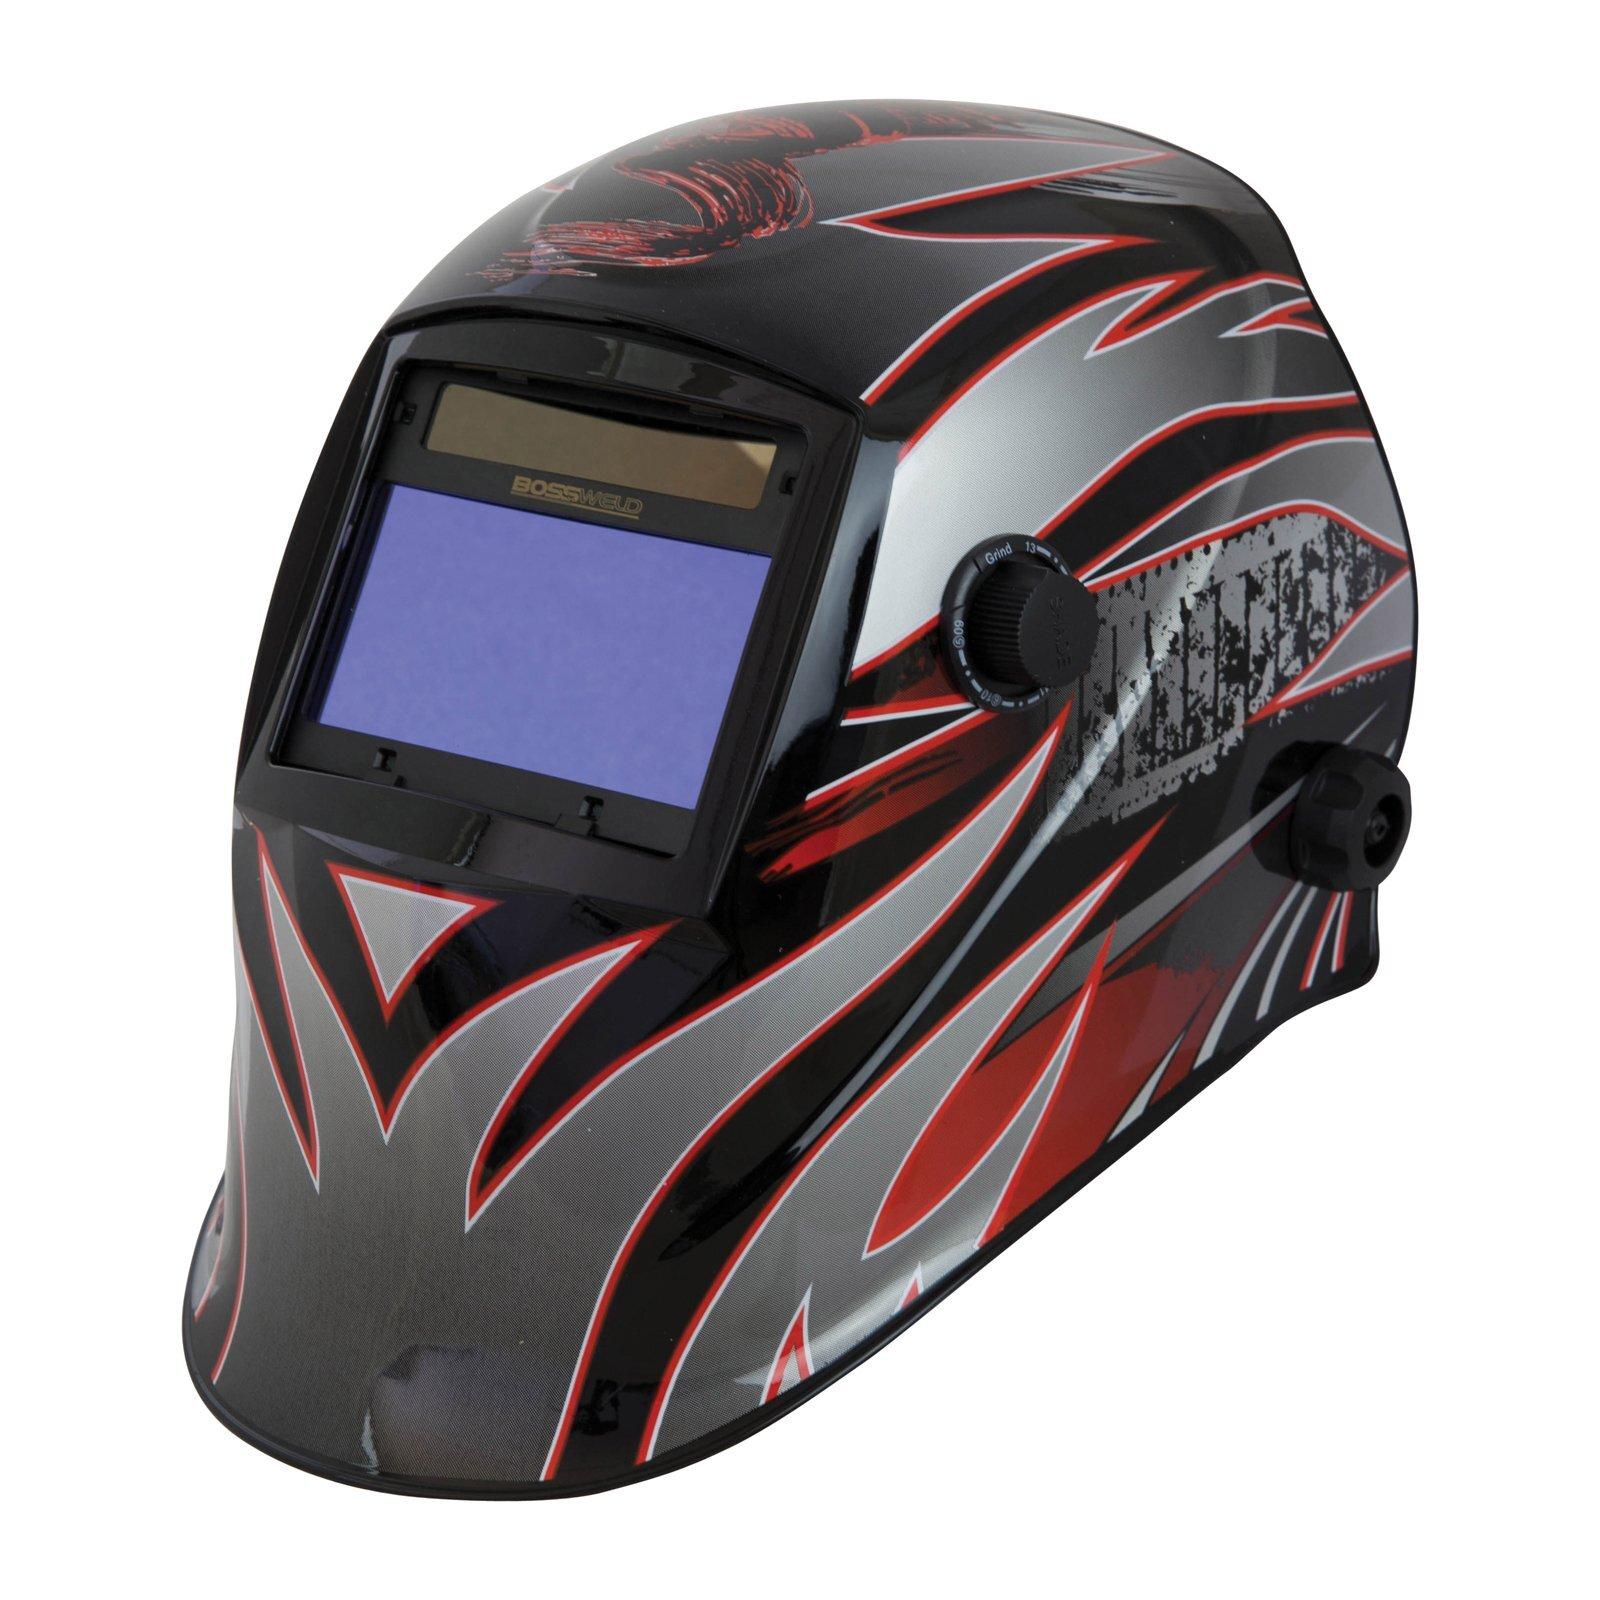 Bossweld XR4 Variable Shade Electronic Welding Helmet